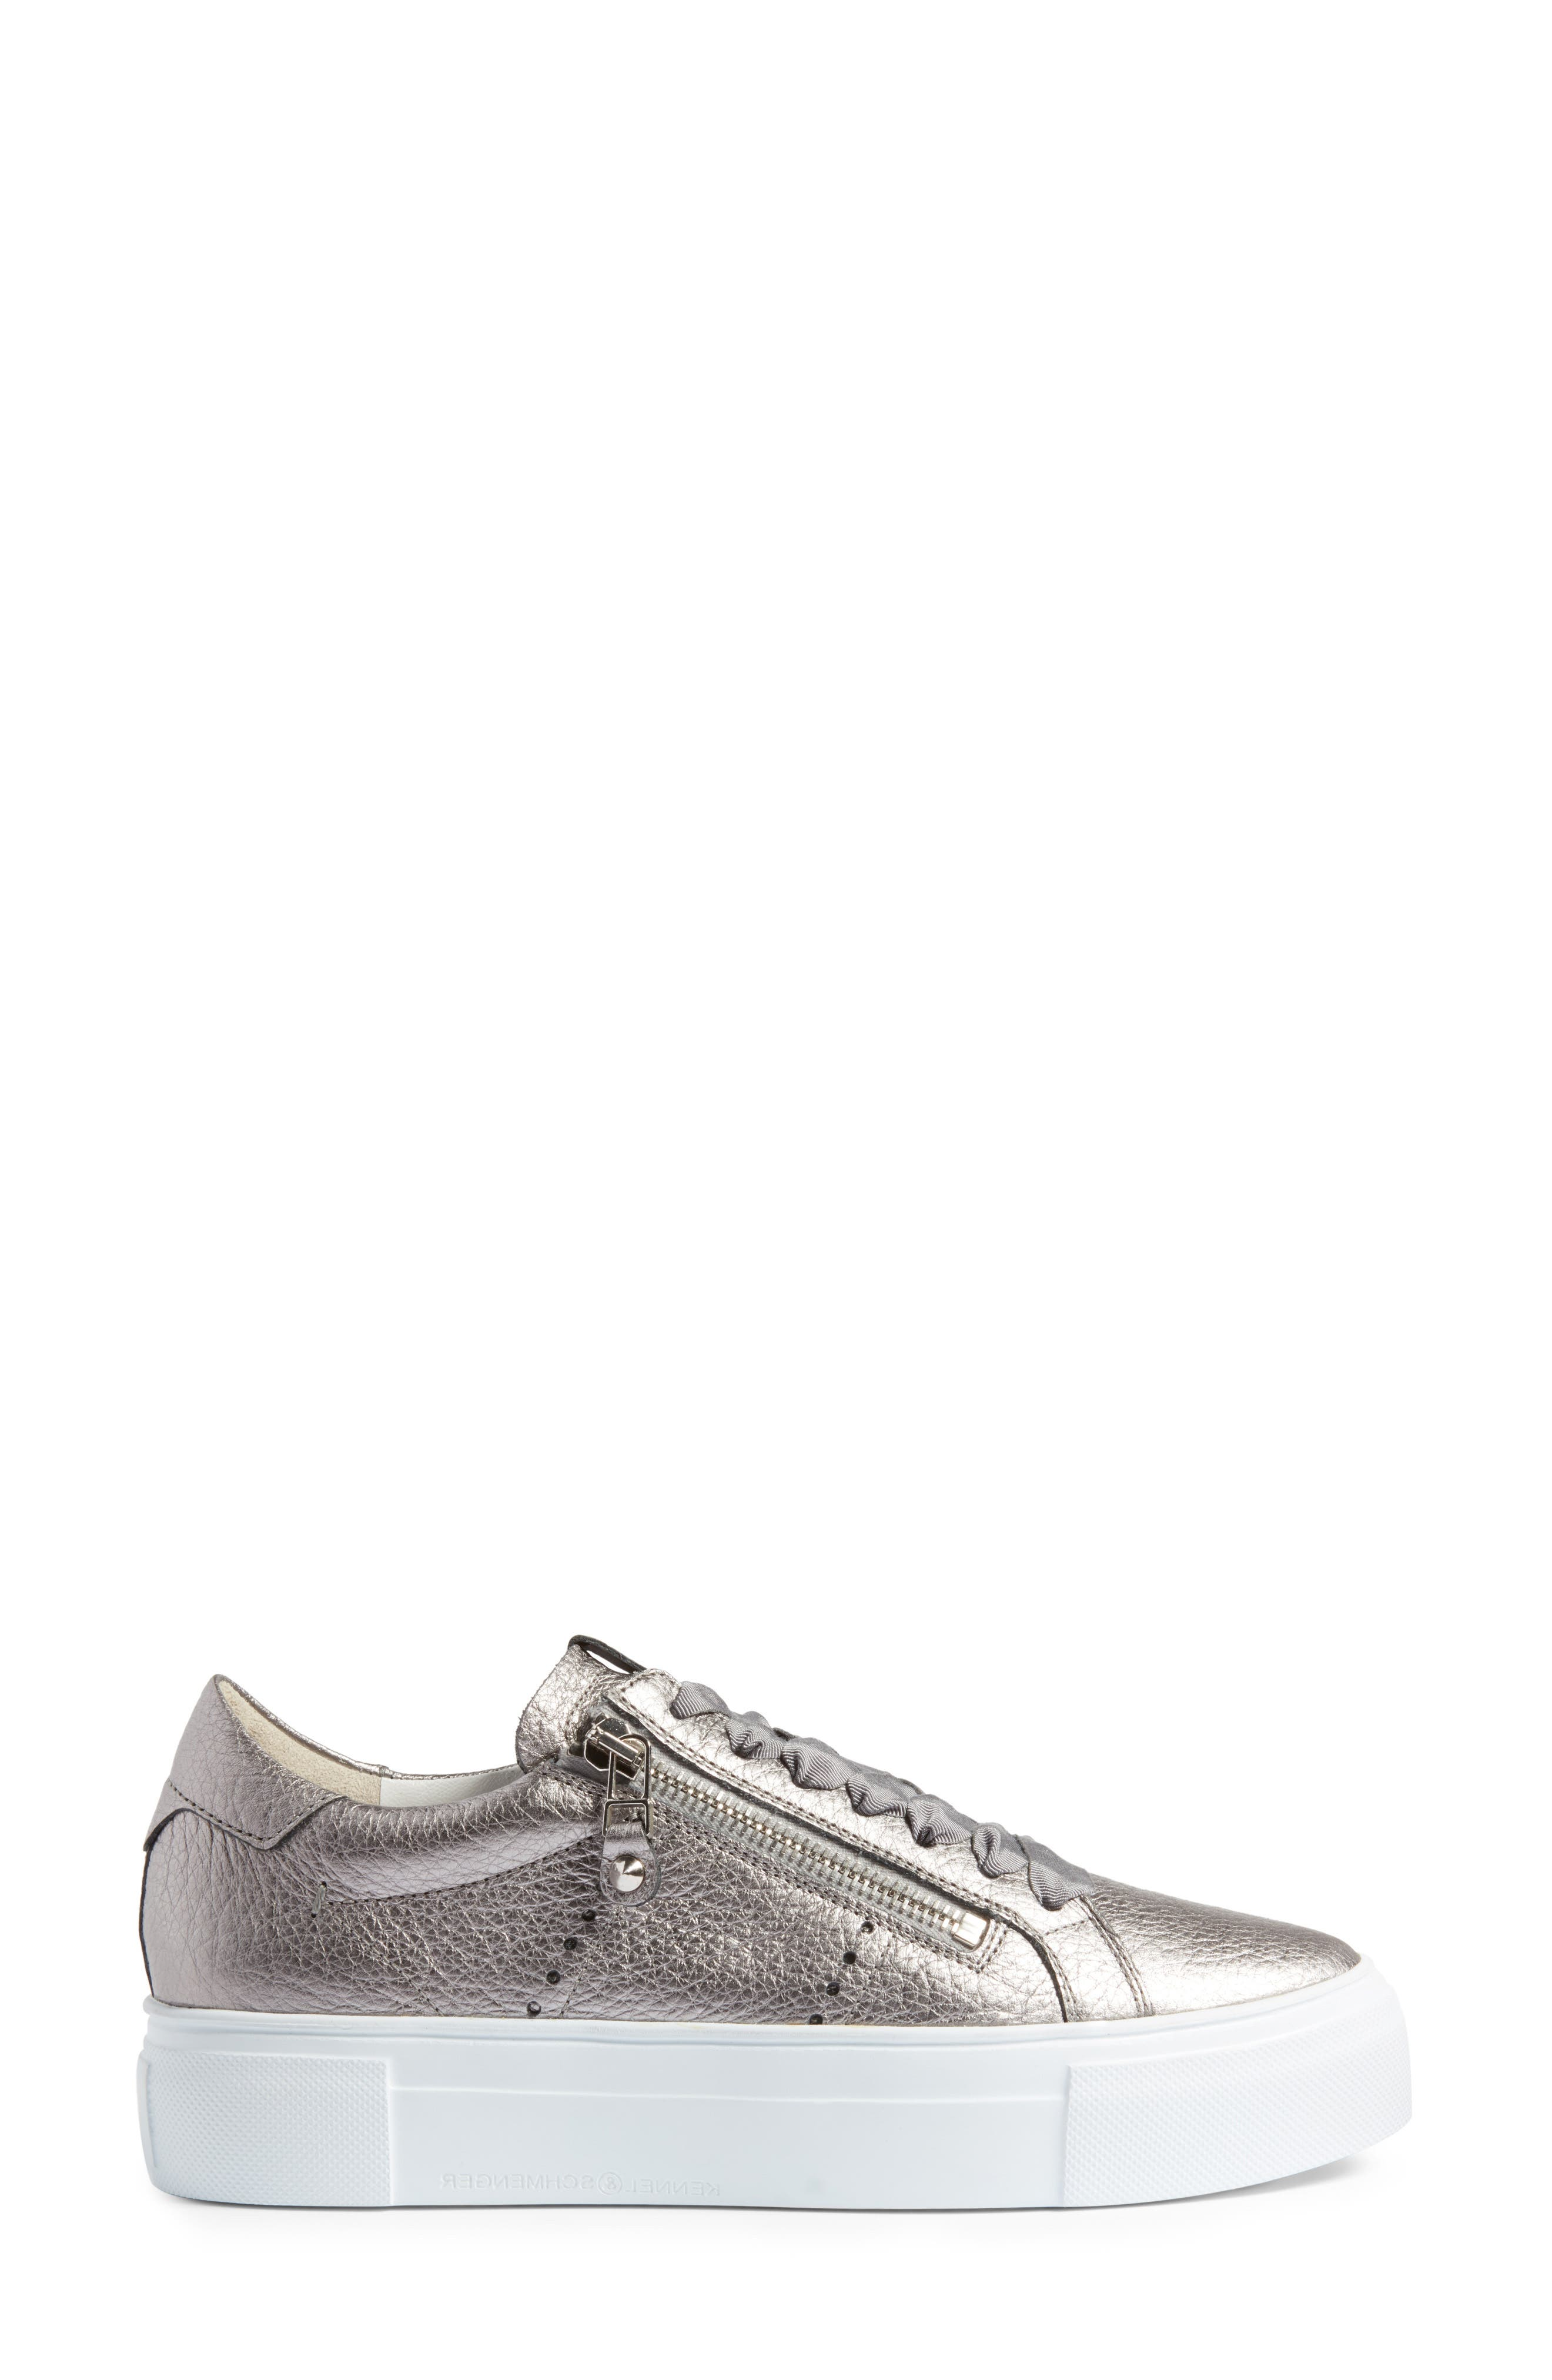 Alternate Image 3  - Kennel & Schmenger Big Low Top Platform Sneaker (Women)